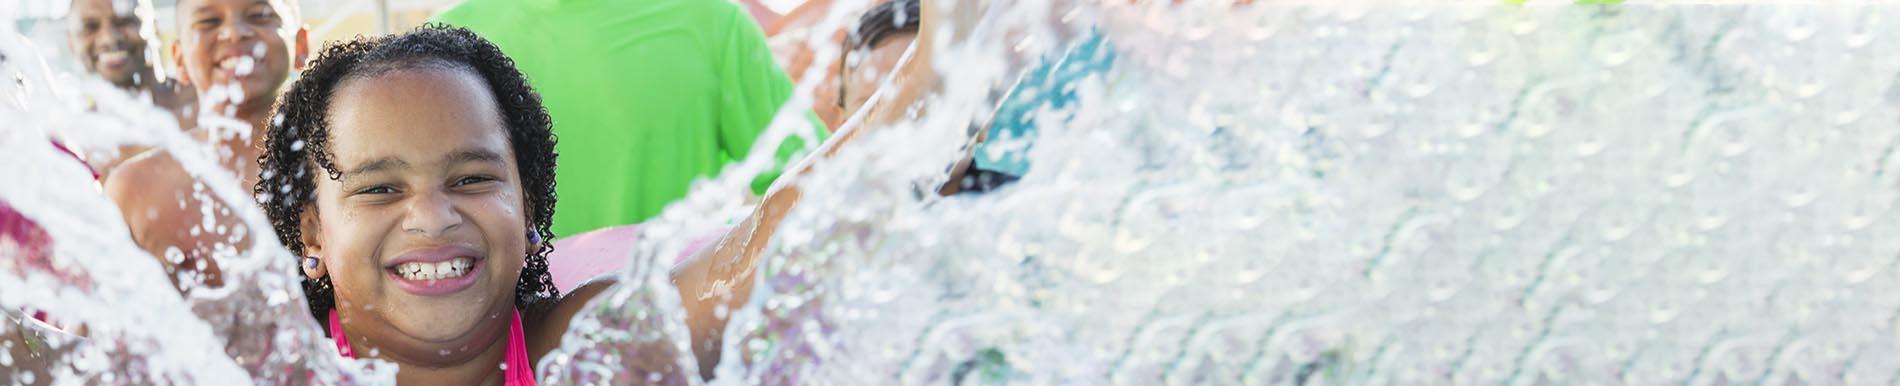 https://www.healthychildren.org/SiteCollectionImage-Homepage-Banners/WaterParkBanner_es.jpg